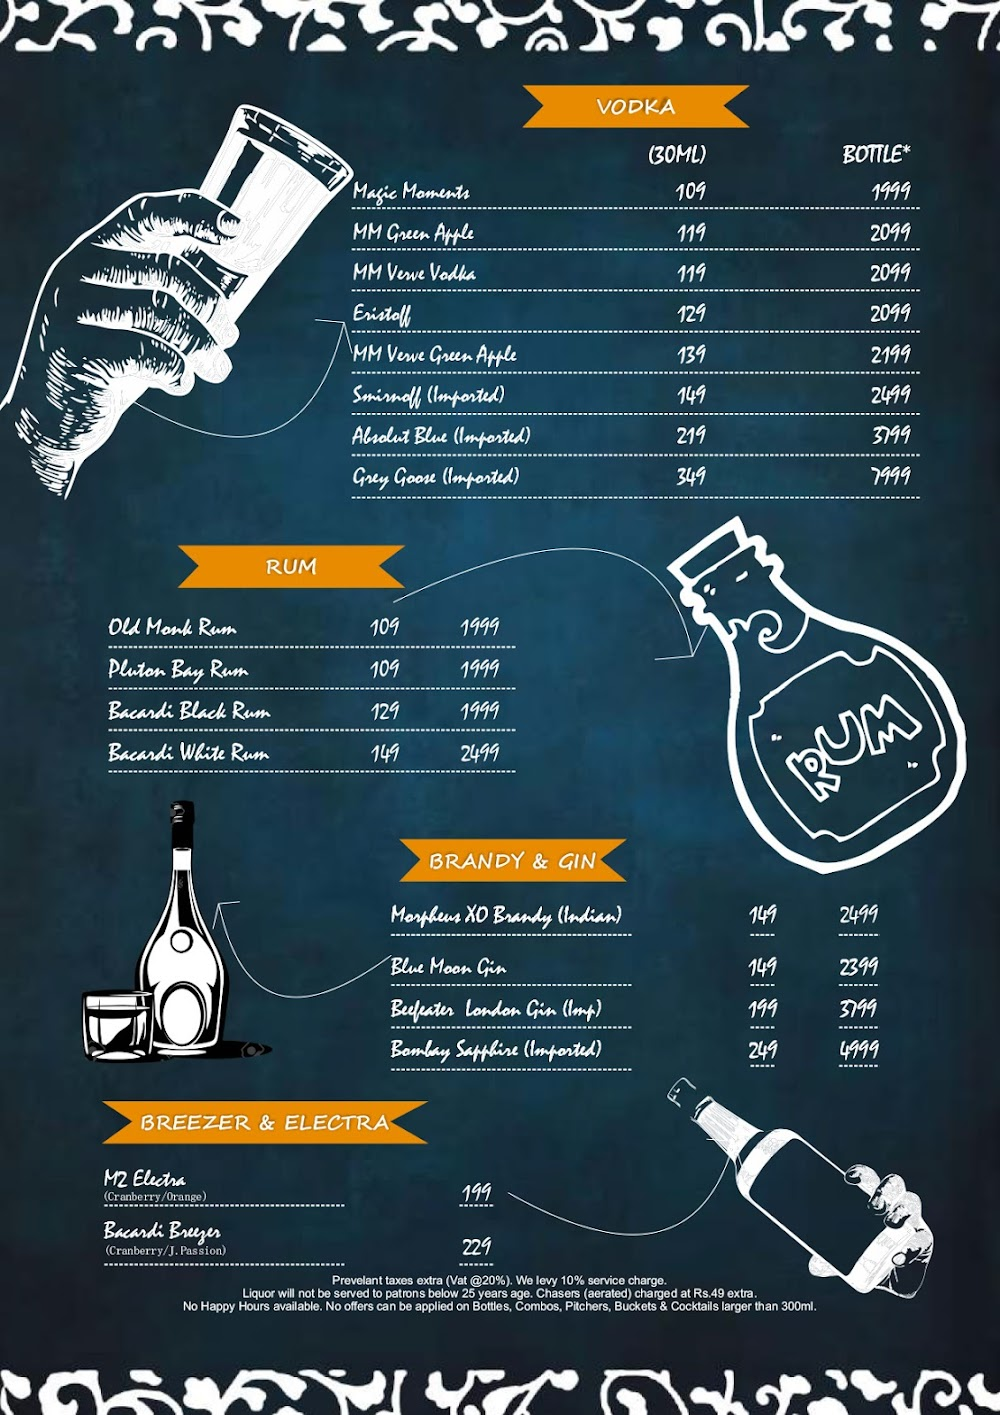 Chill'm Bar & Cafe menu 4